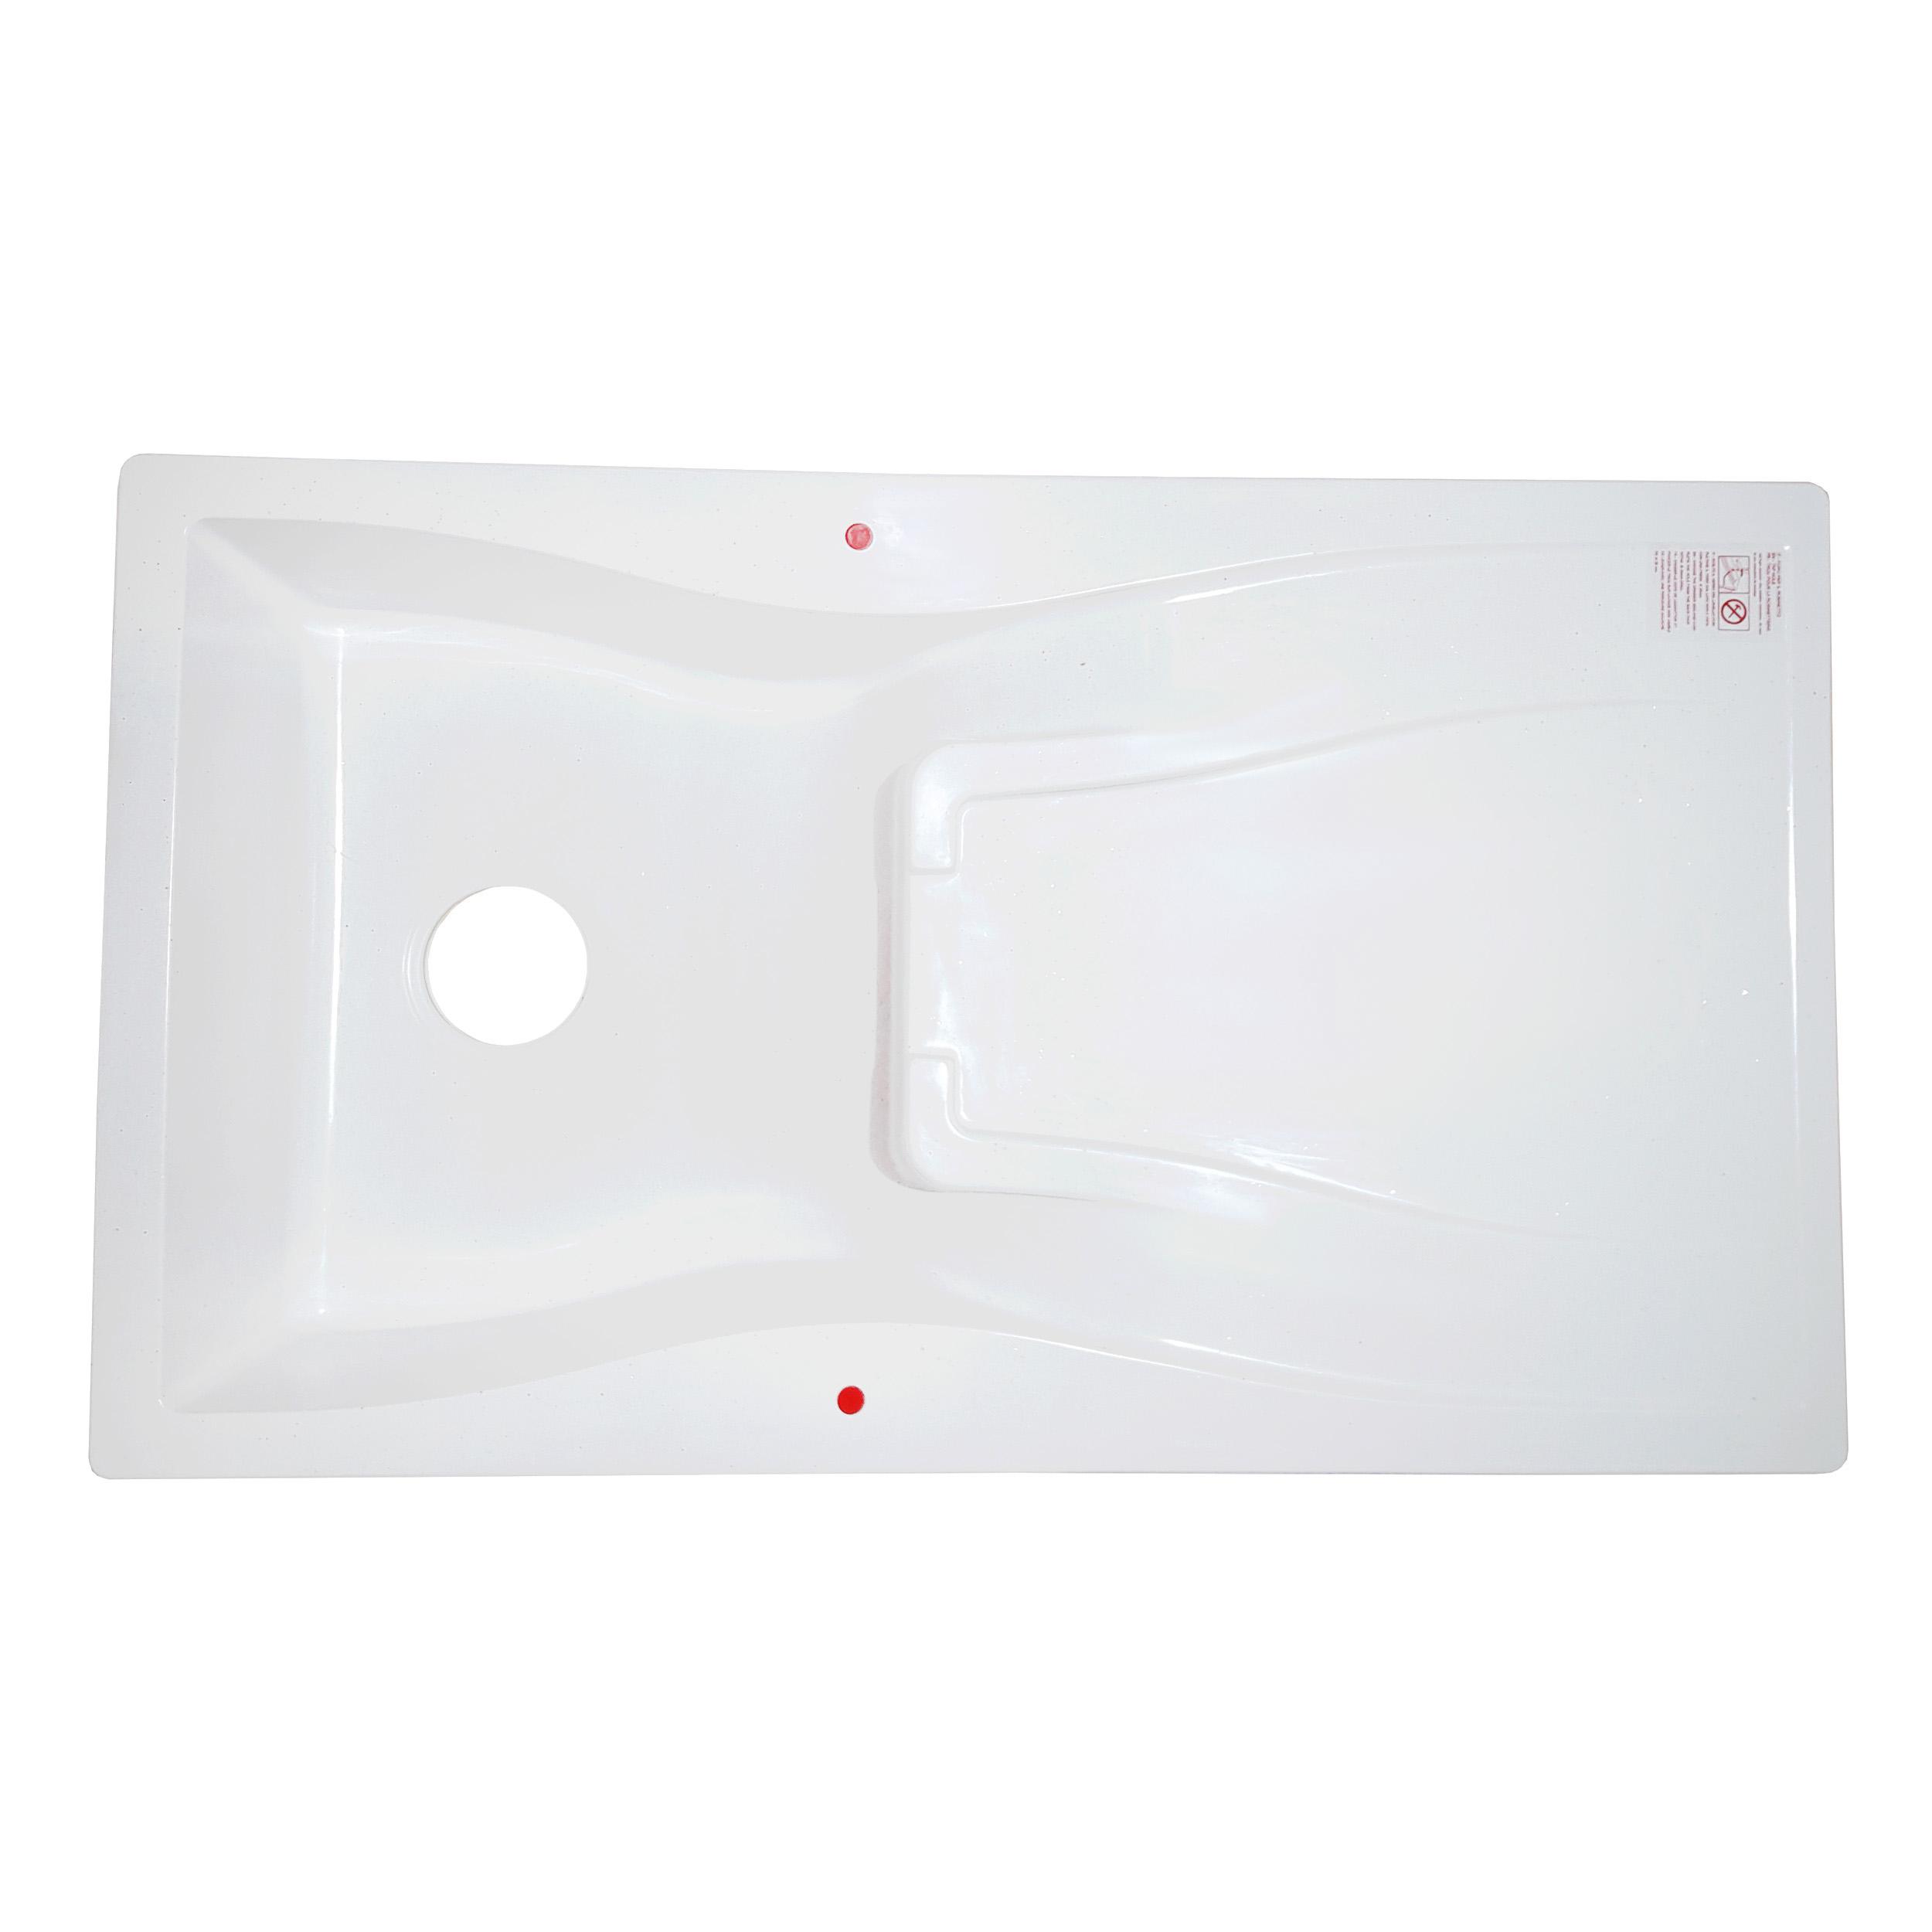 سینک ظرفشویی کد 207 توکار